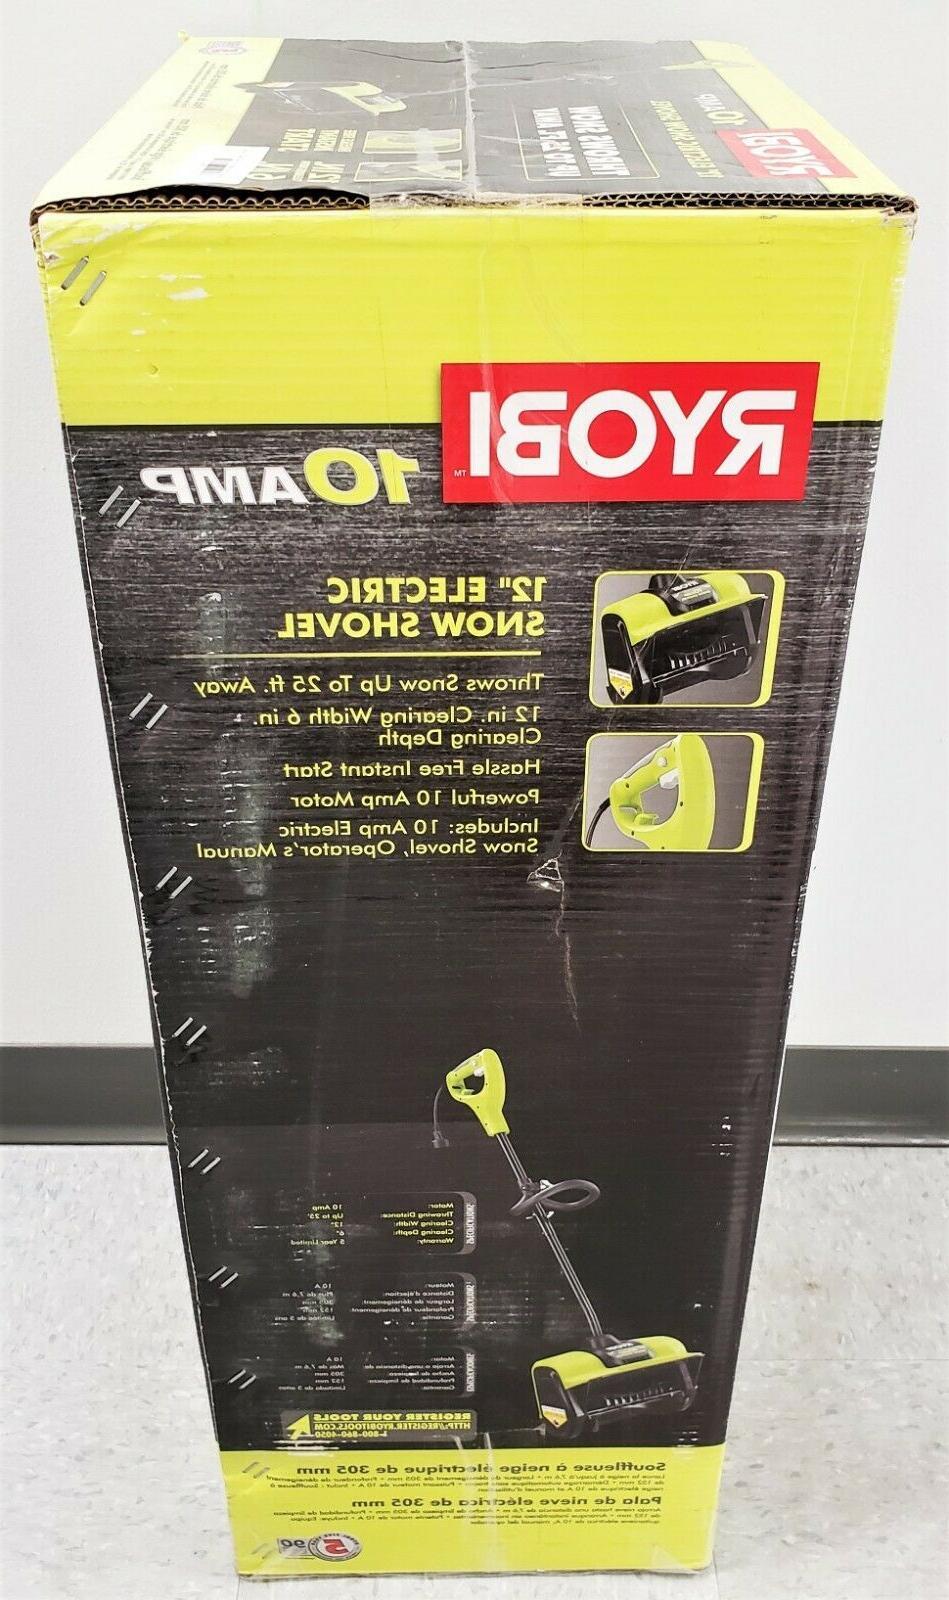 Ryobi RYAC804-S 10 Amp Corded Electric Blower Shovel New